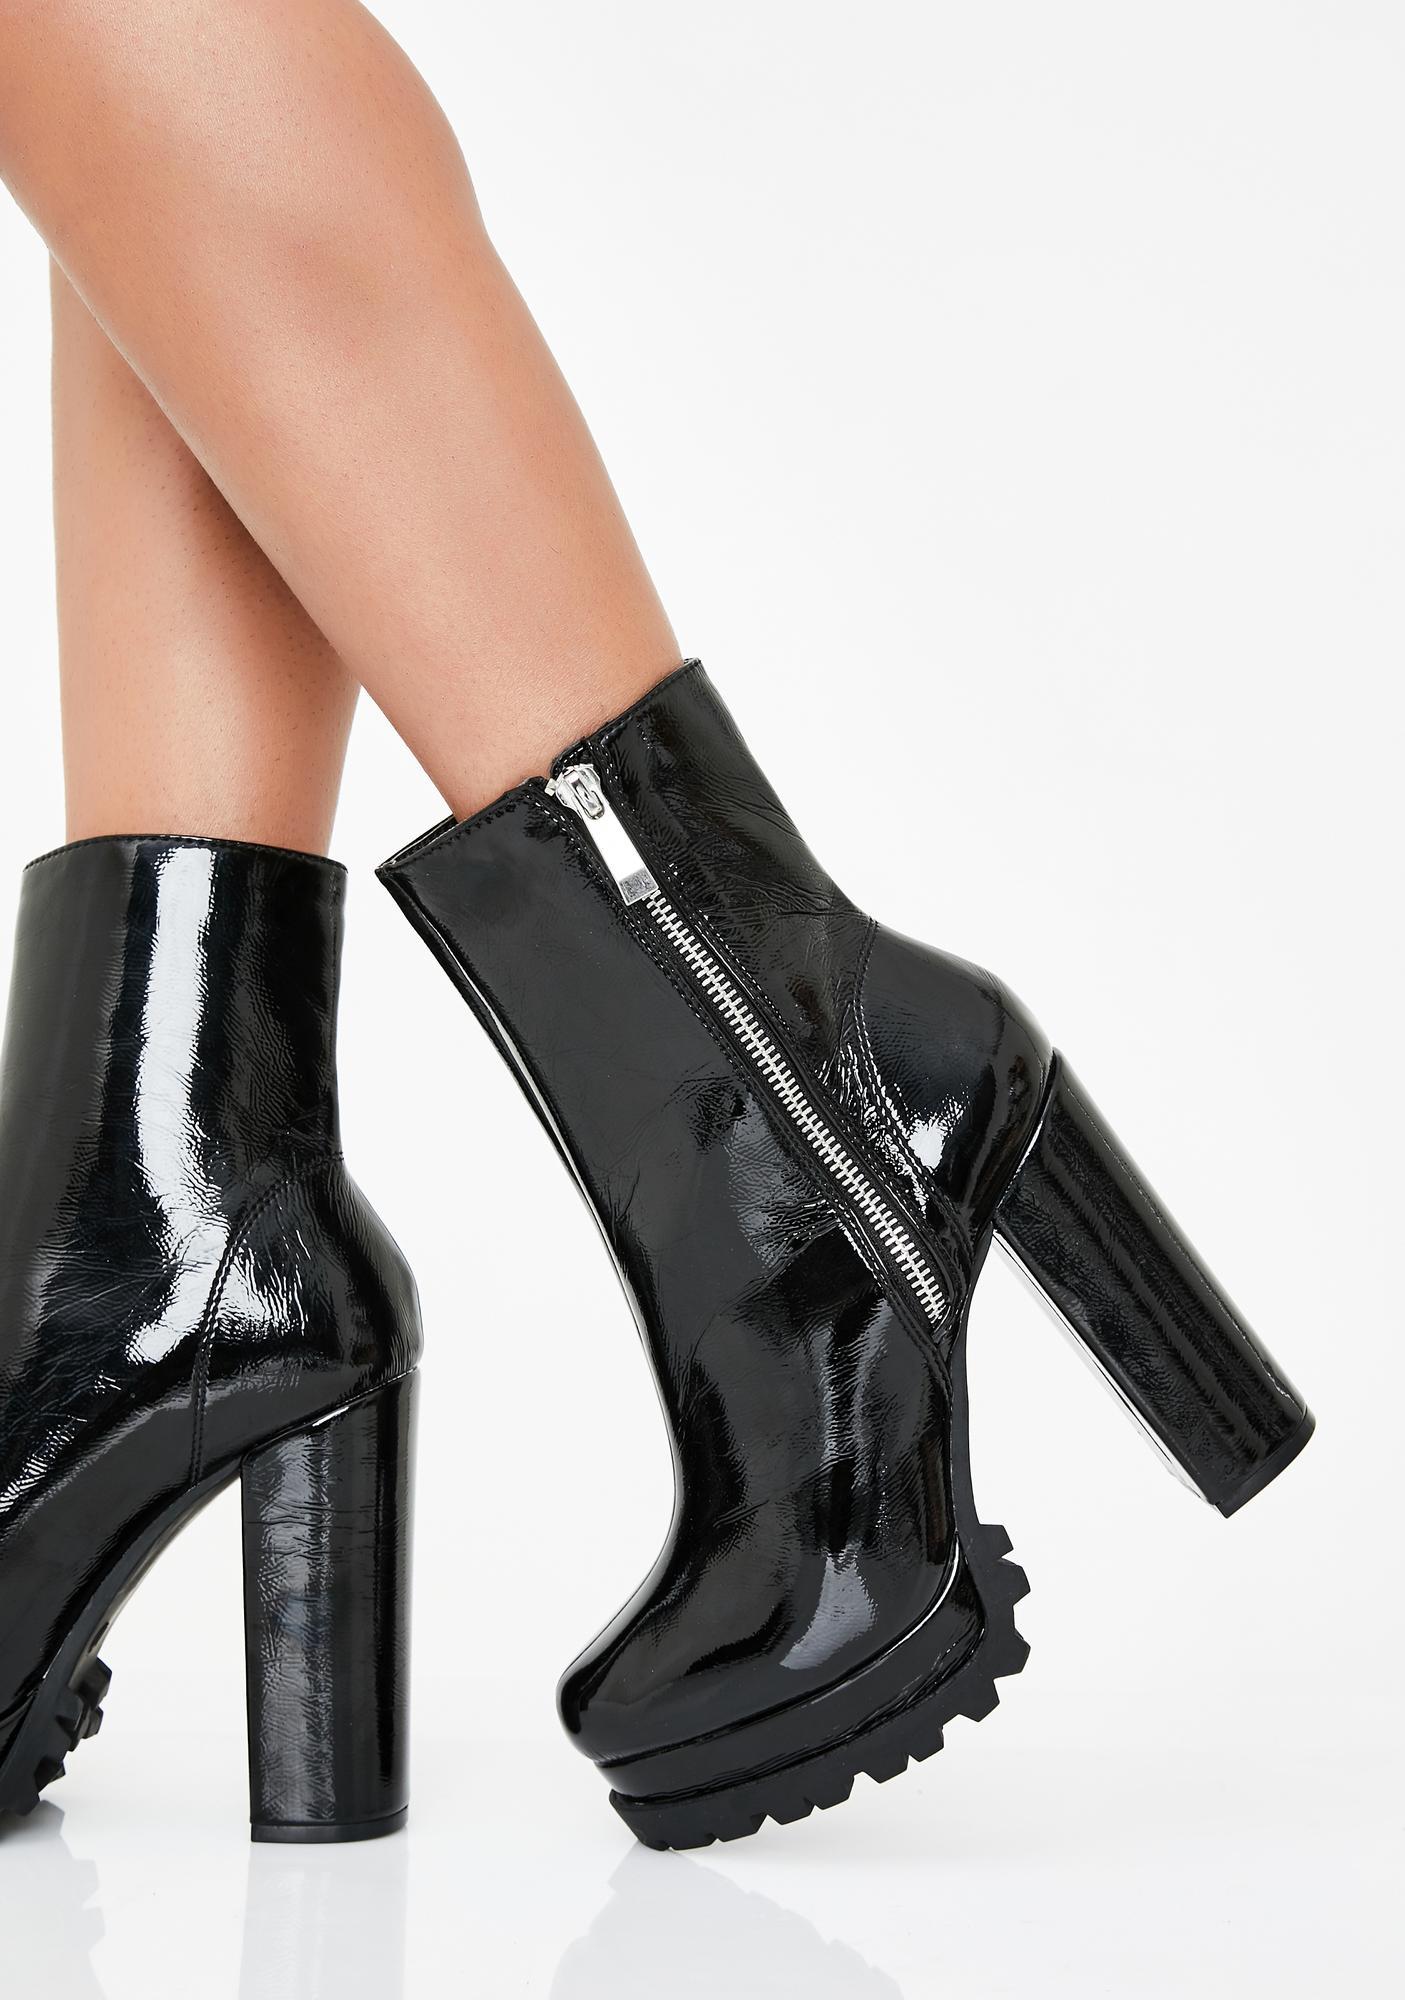 Kickin' Azz High Heel Boots